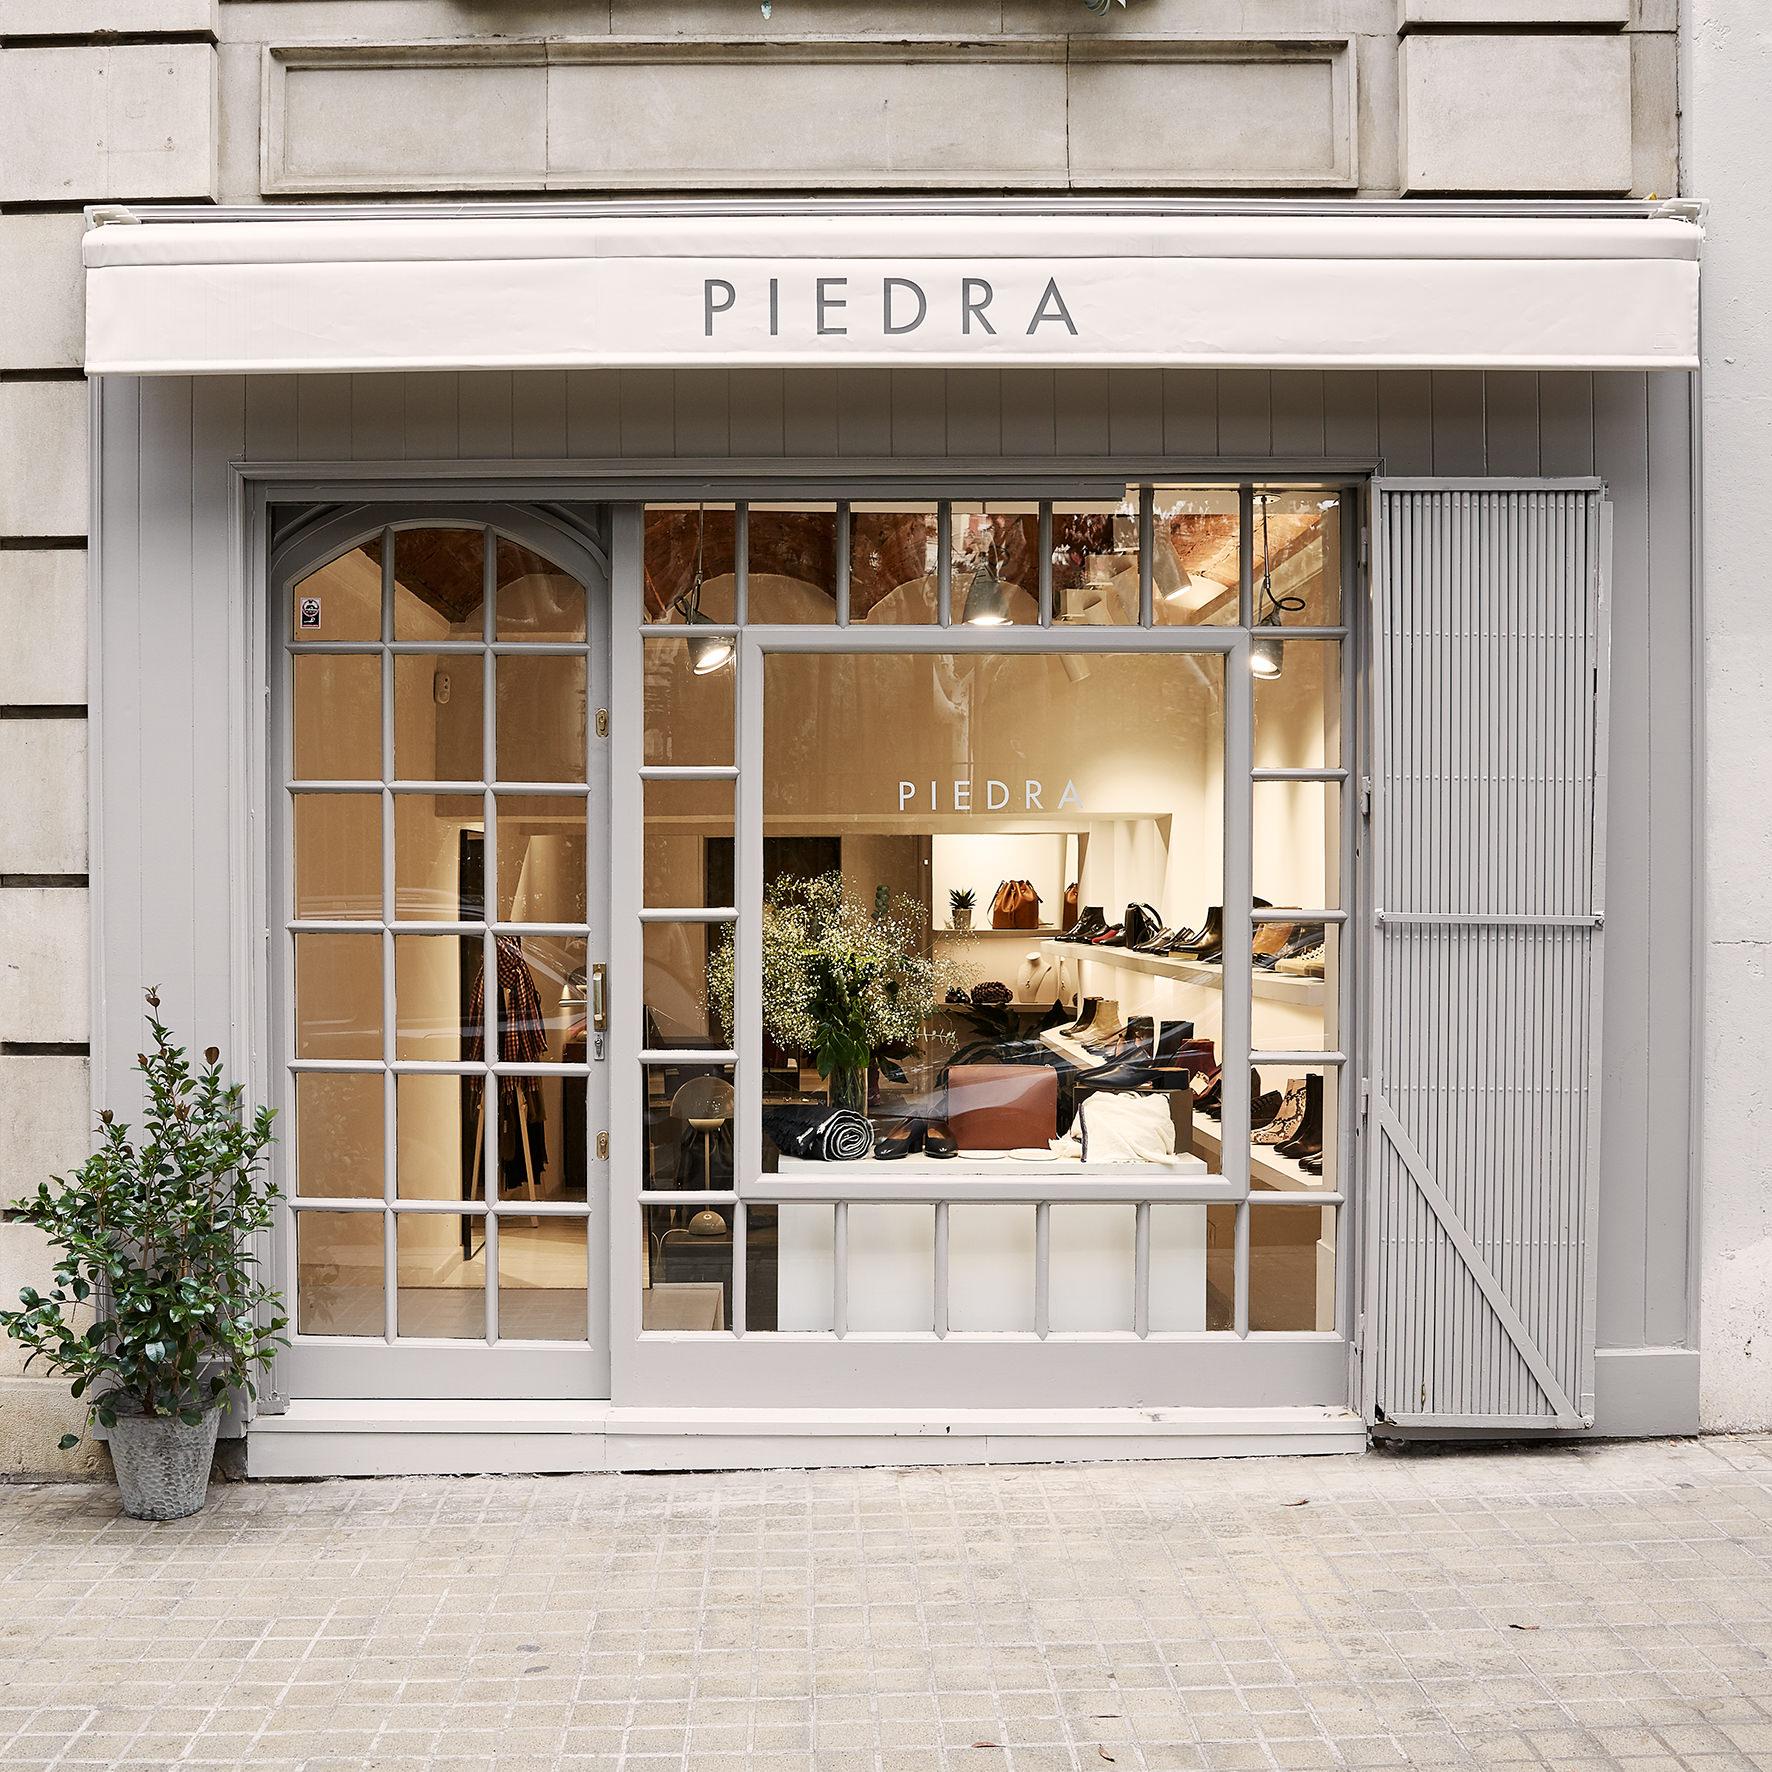 Fachada Piedra Store